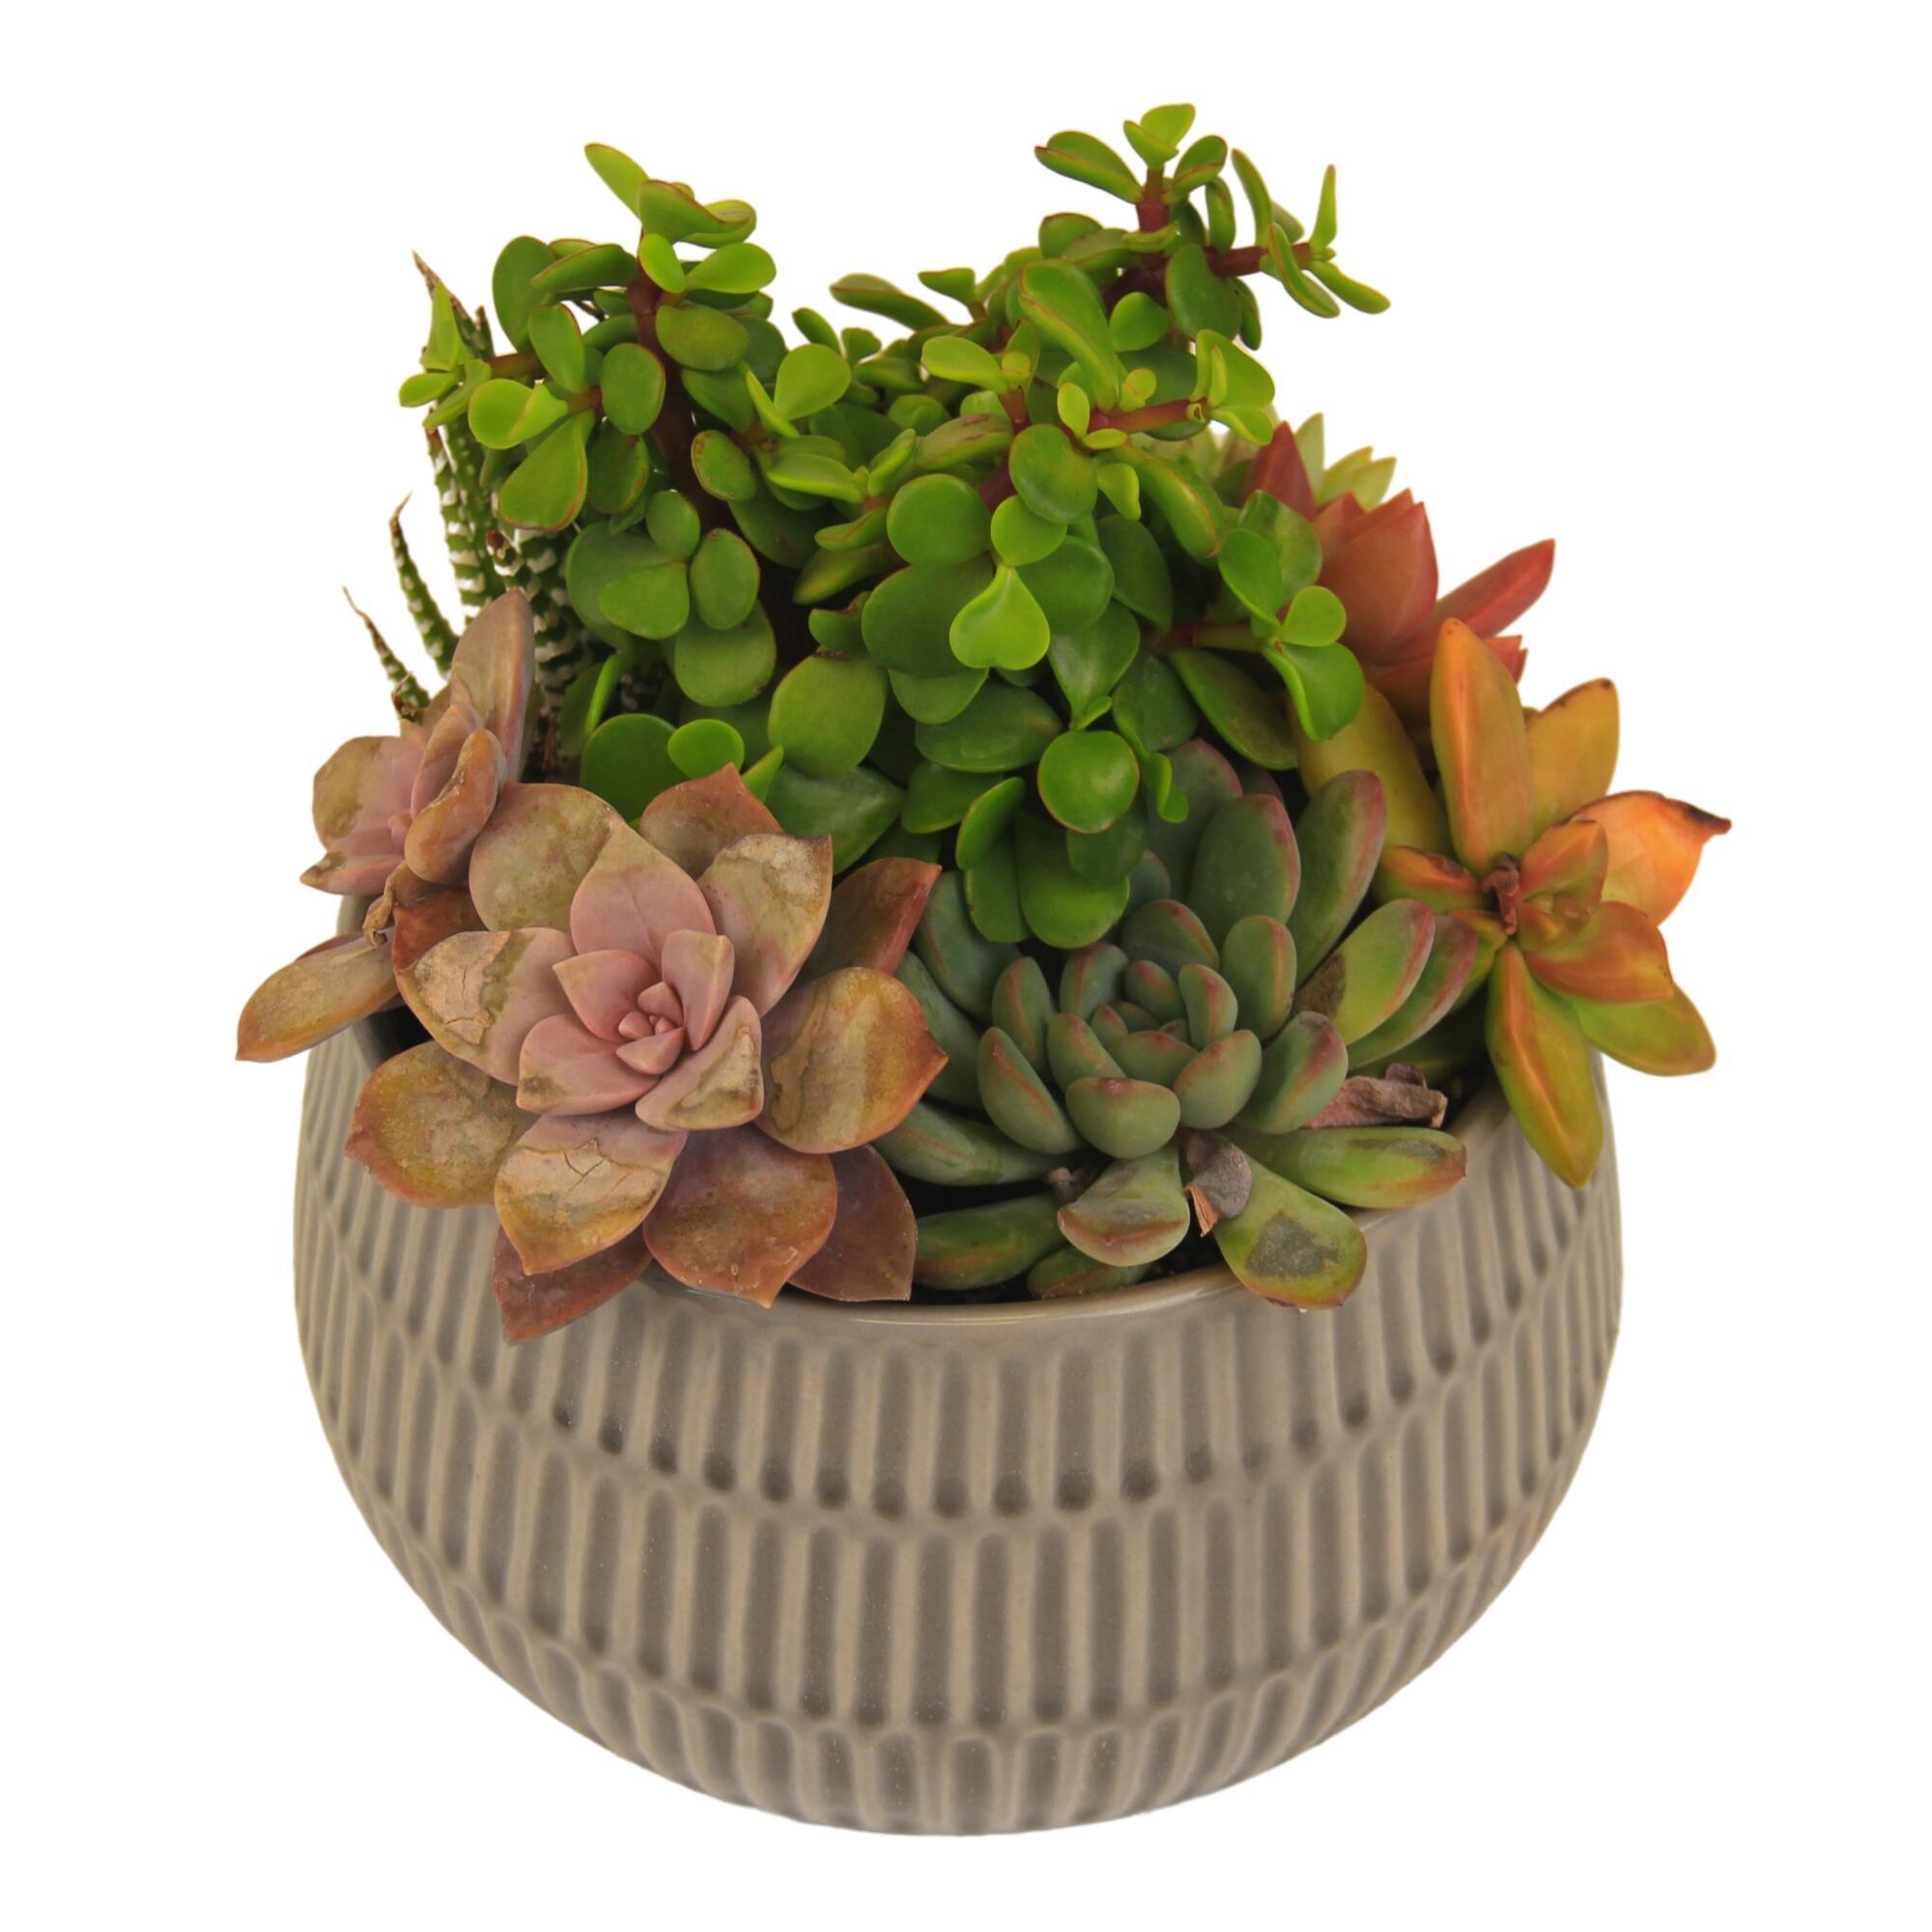 Live Succulent Plant Arrangement in Ribbed Ceramic Pot by World Market